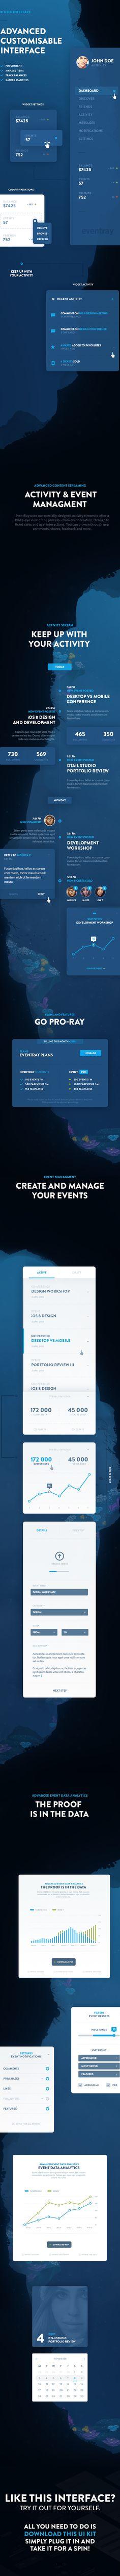 EventRay UI Kit - Free Download on Behance #dark